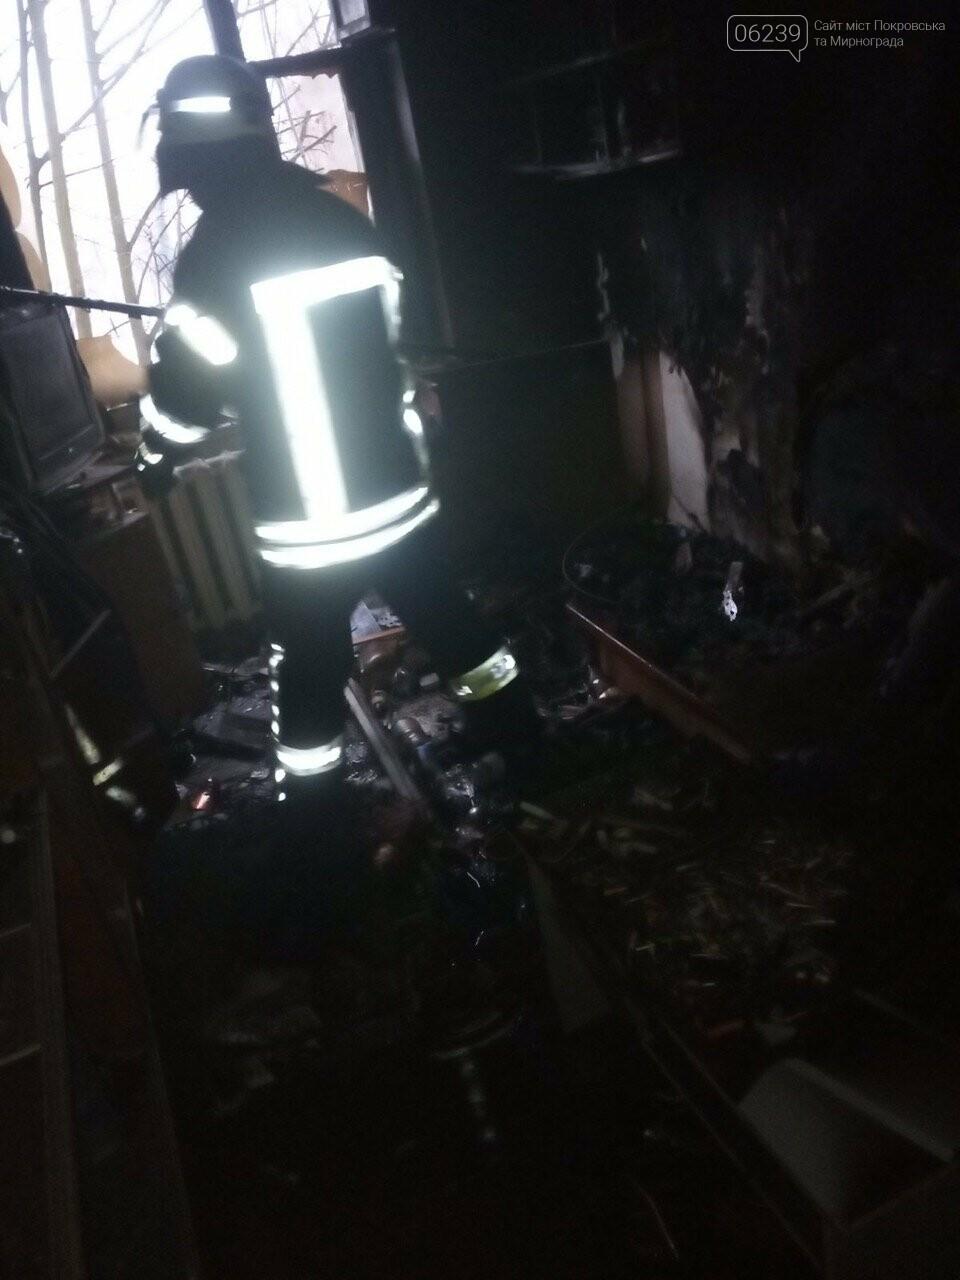 В Покровске во время пожара погиб 40-летний мужчина  (ФОТО), фото-2